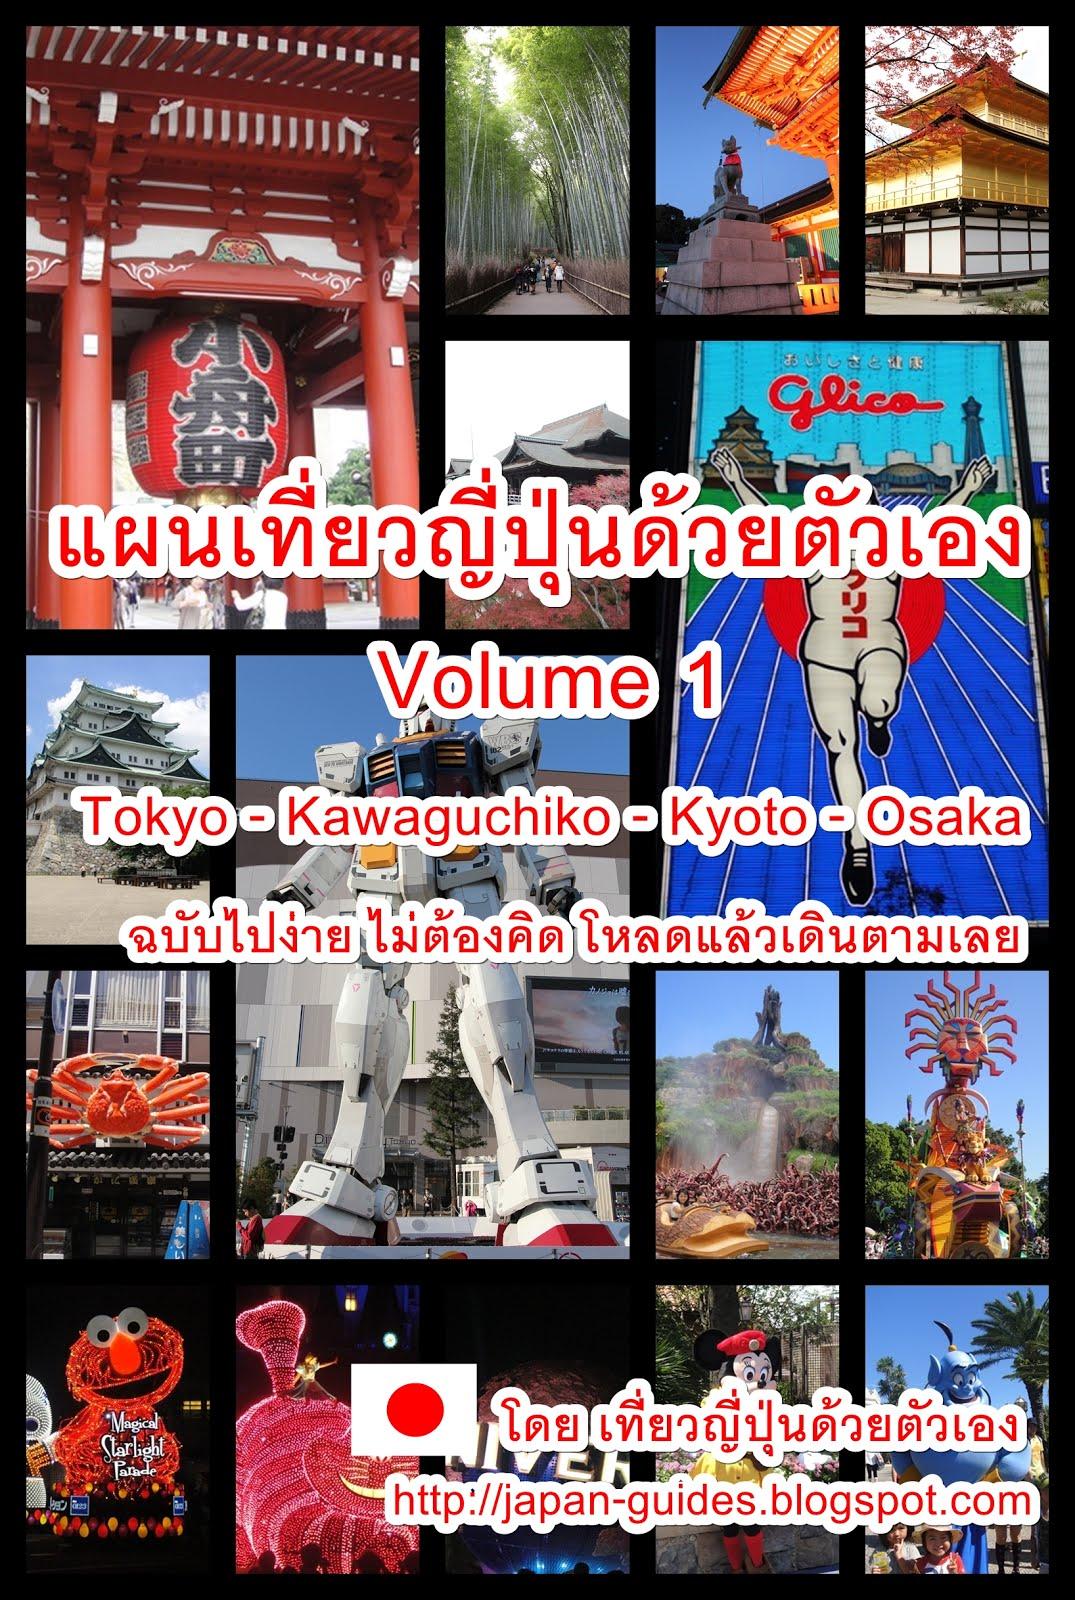 Ebook แผนเที่ยวญี่ปุ่นด้วยตัวเอง V.1